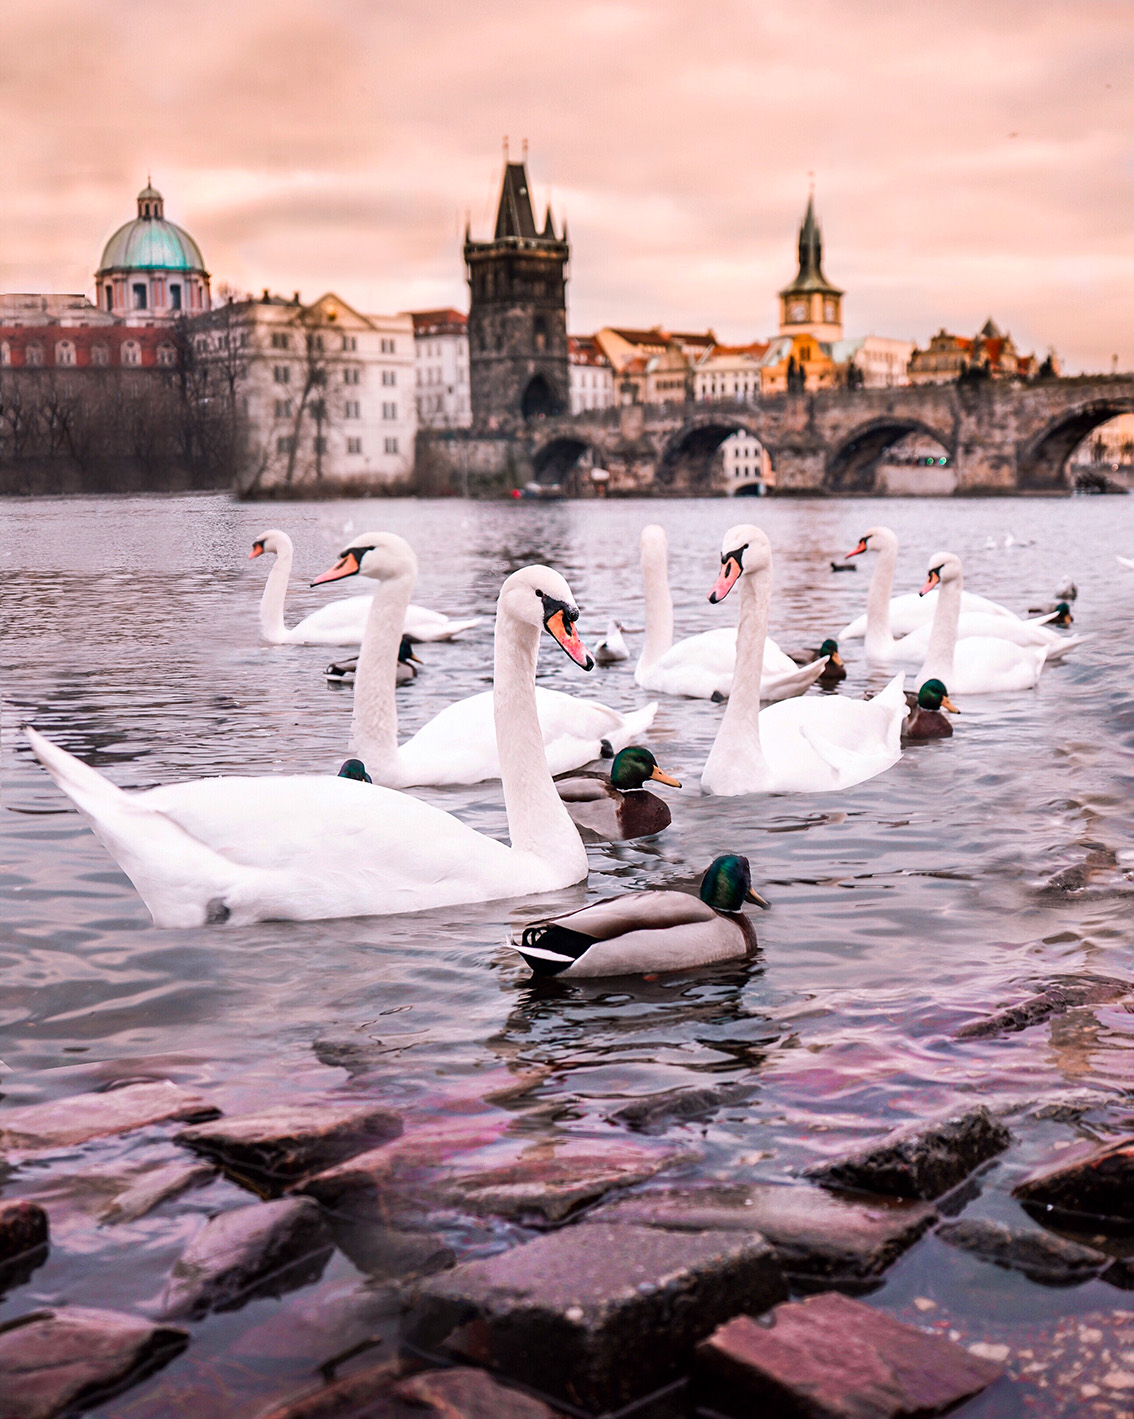 30 Weekend a Praga: 7 cose da vedere, dove dormire, gli indirizzi food e i Mercatini di Natale più belli.